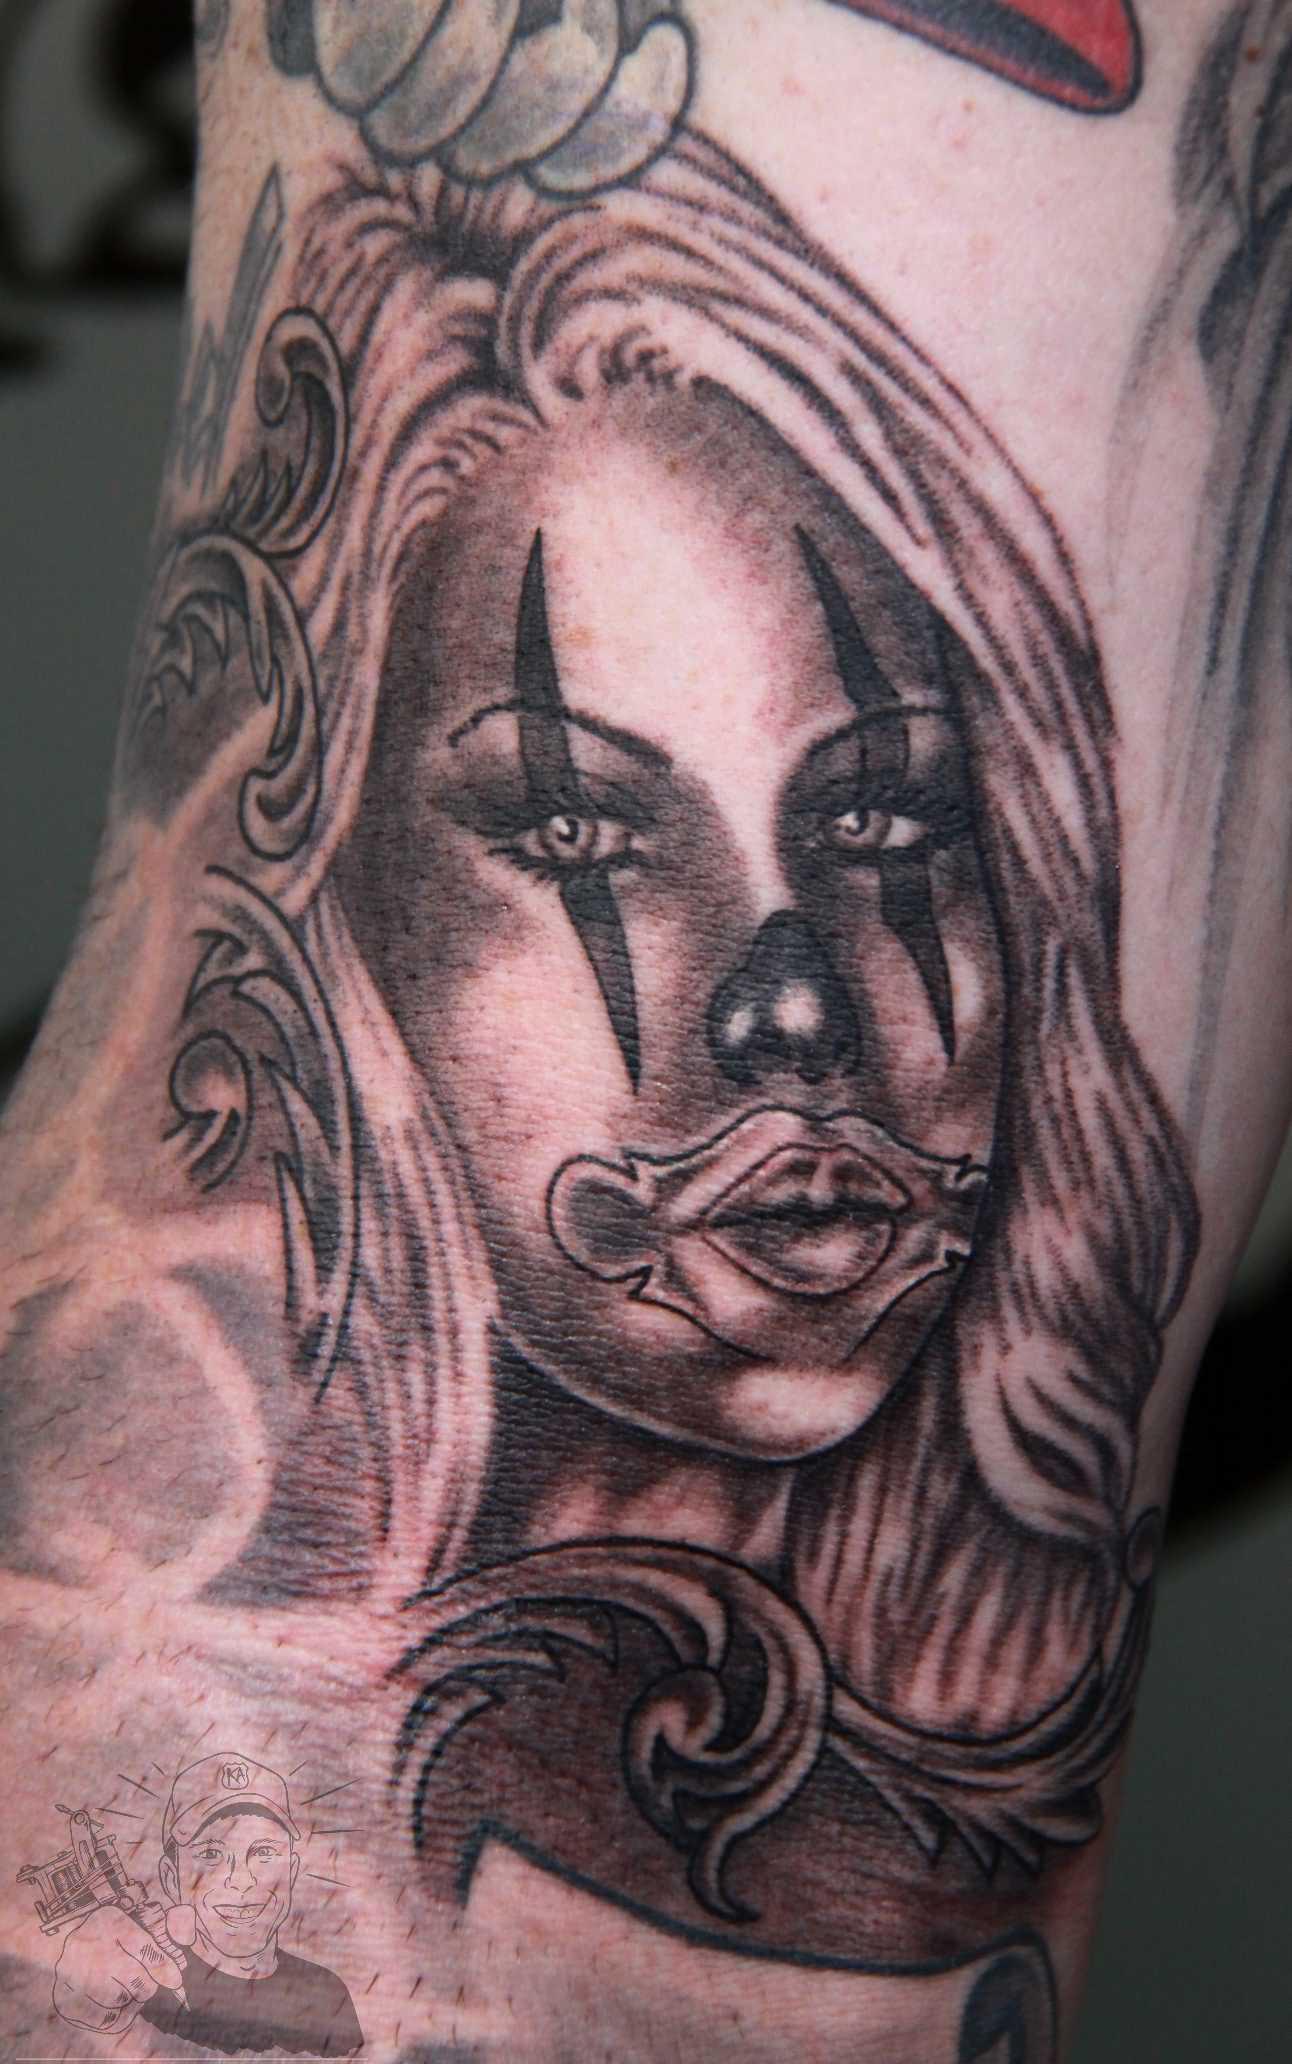 clown girl tattoo design. Black Bedroom Furniture Sets. Home Design Ideas